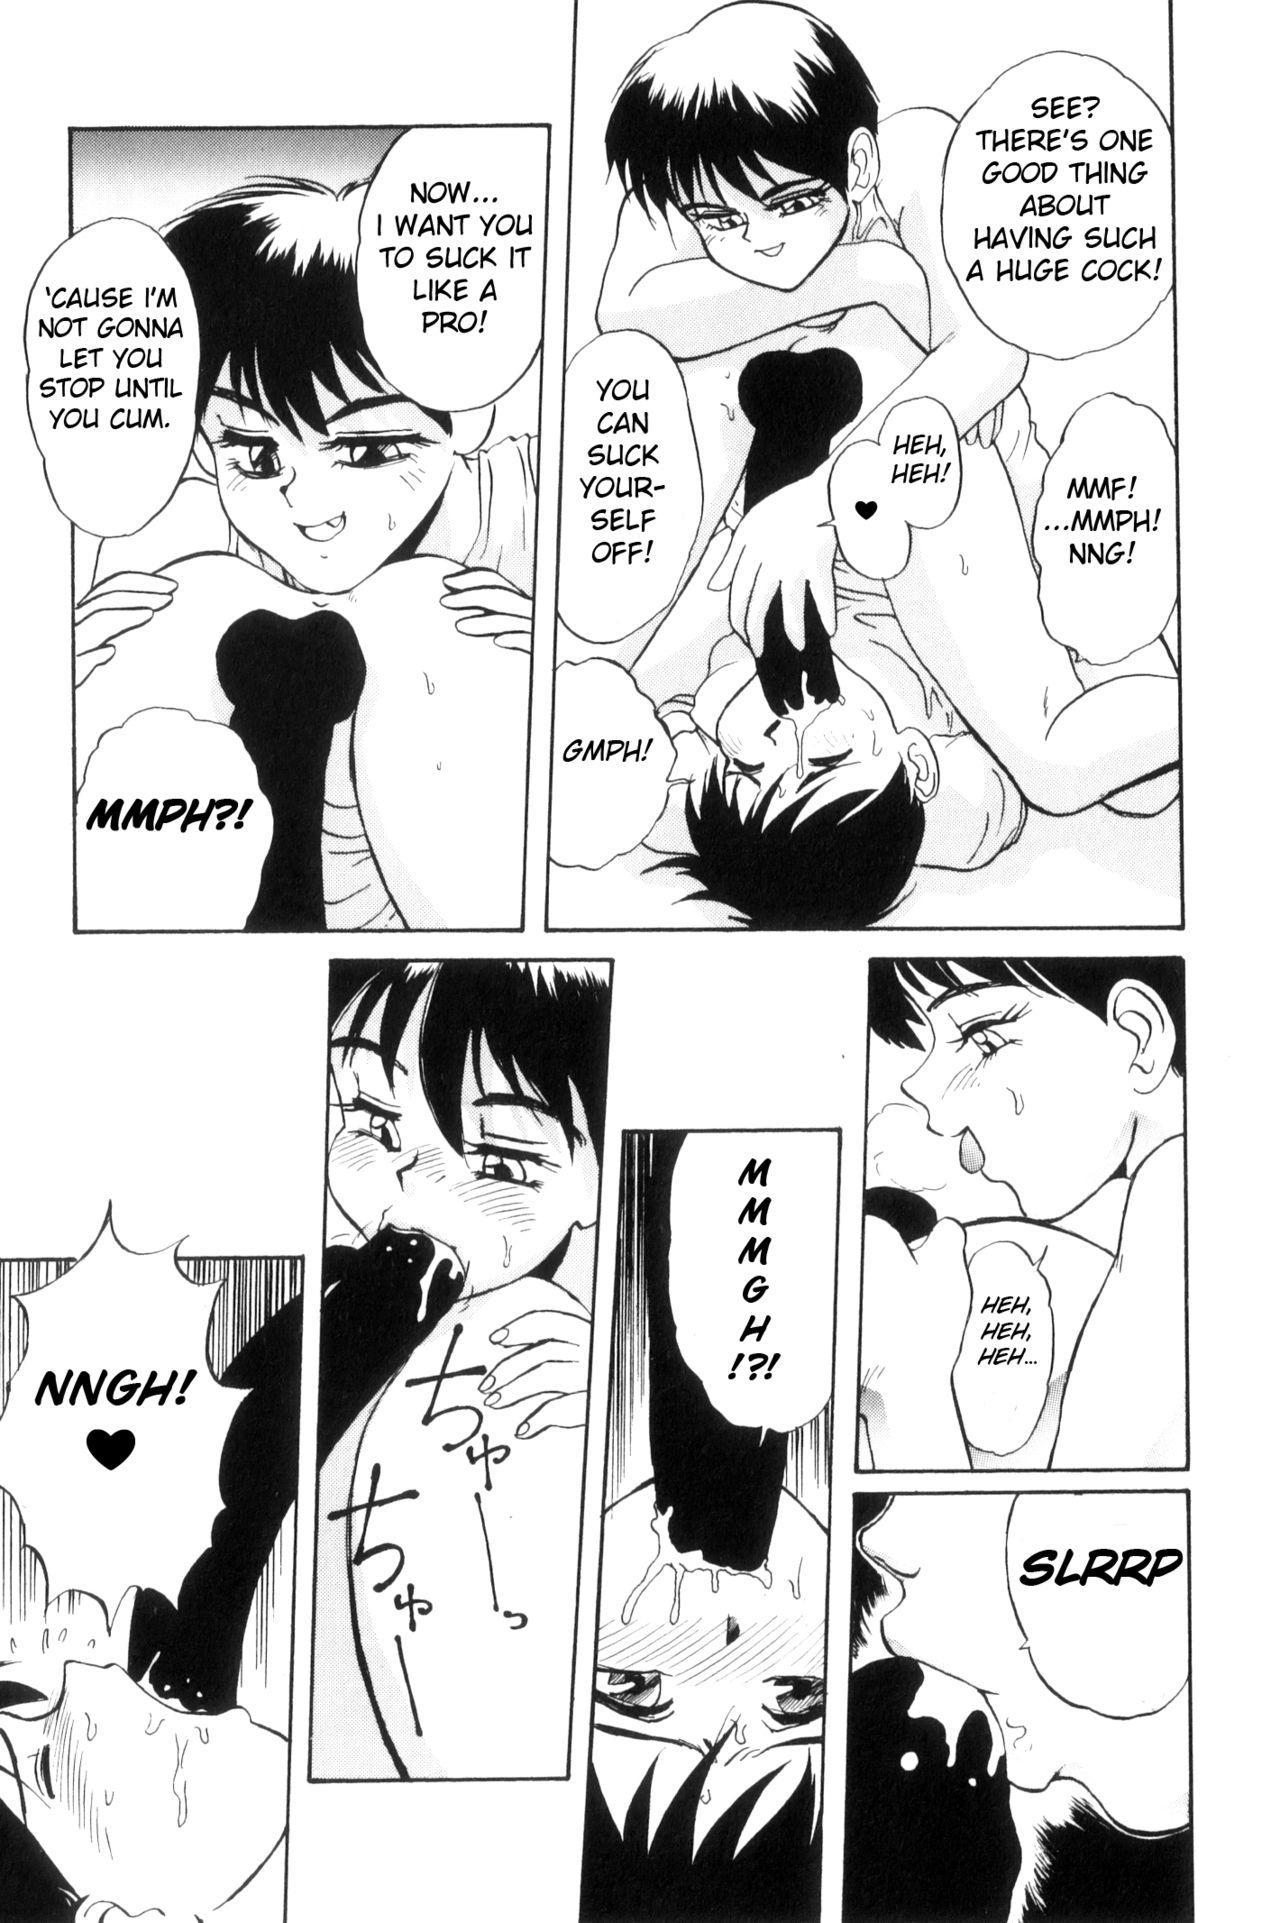 [NeWMeN] Secret Plot [Shinsouban] Ch. 1-6 [English] 91